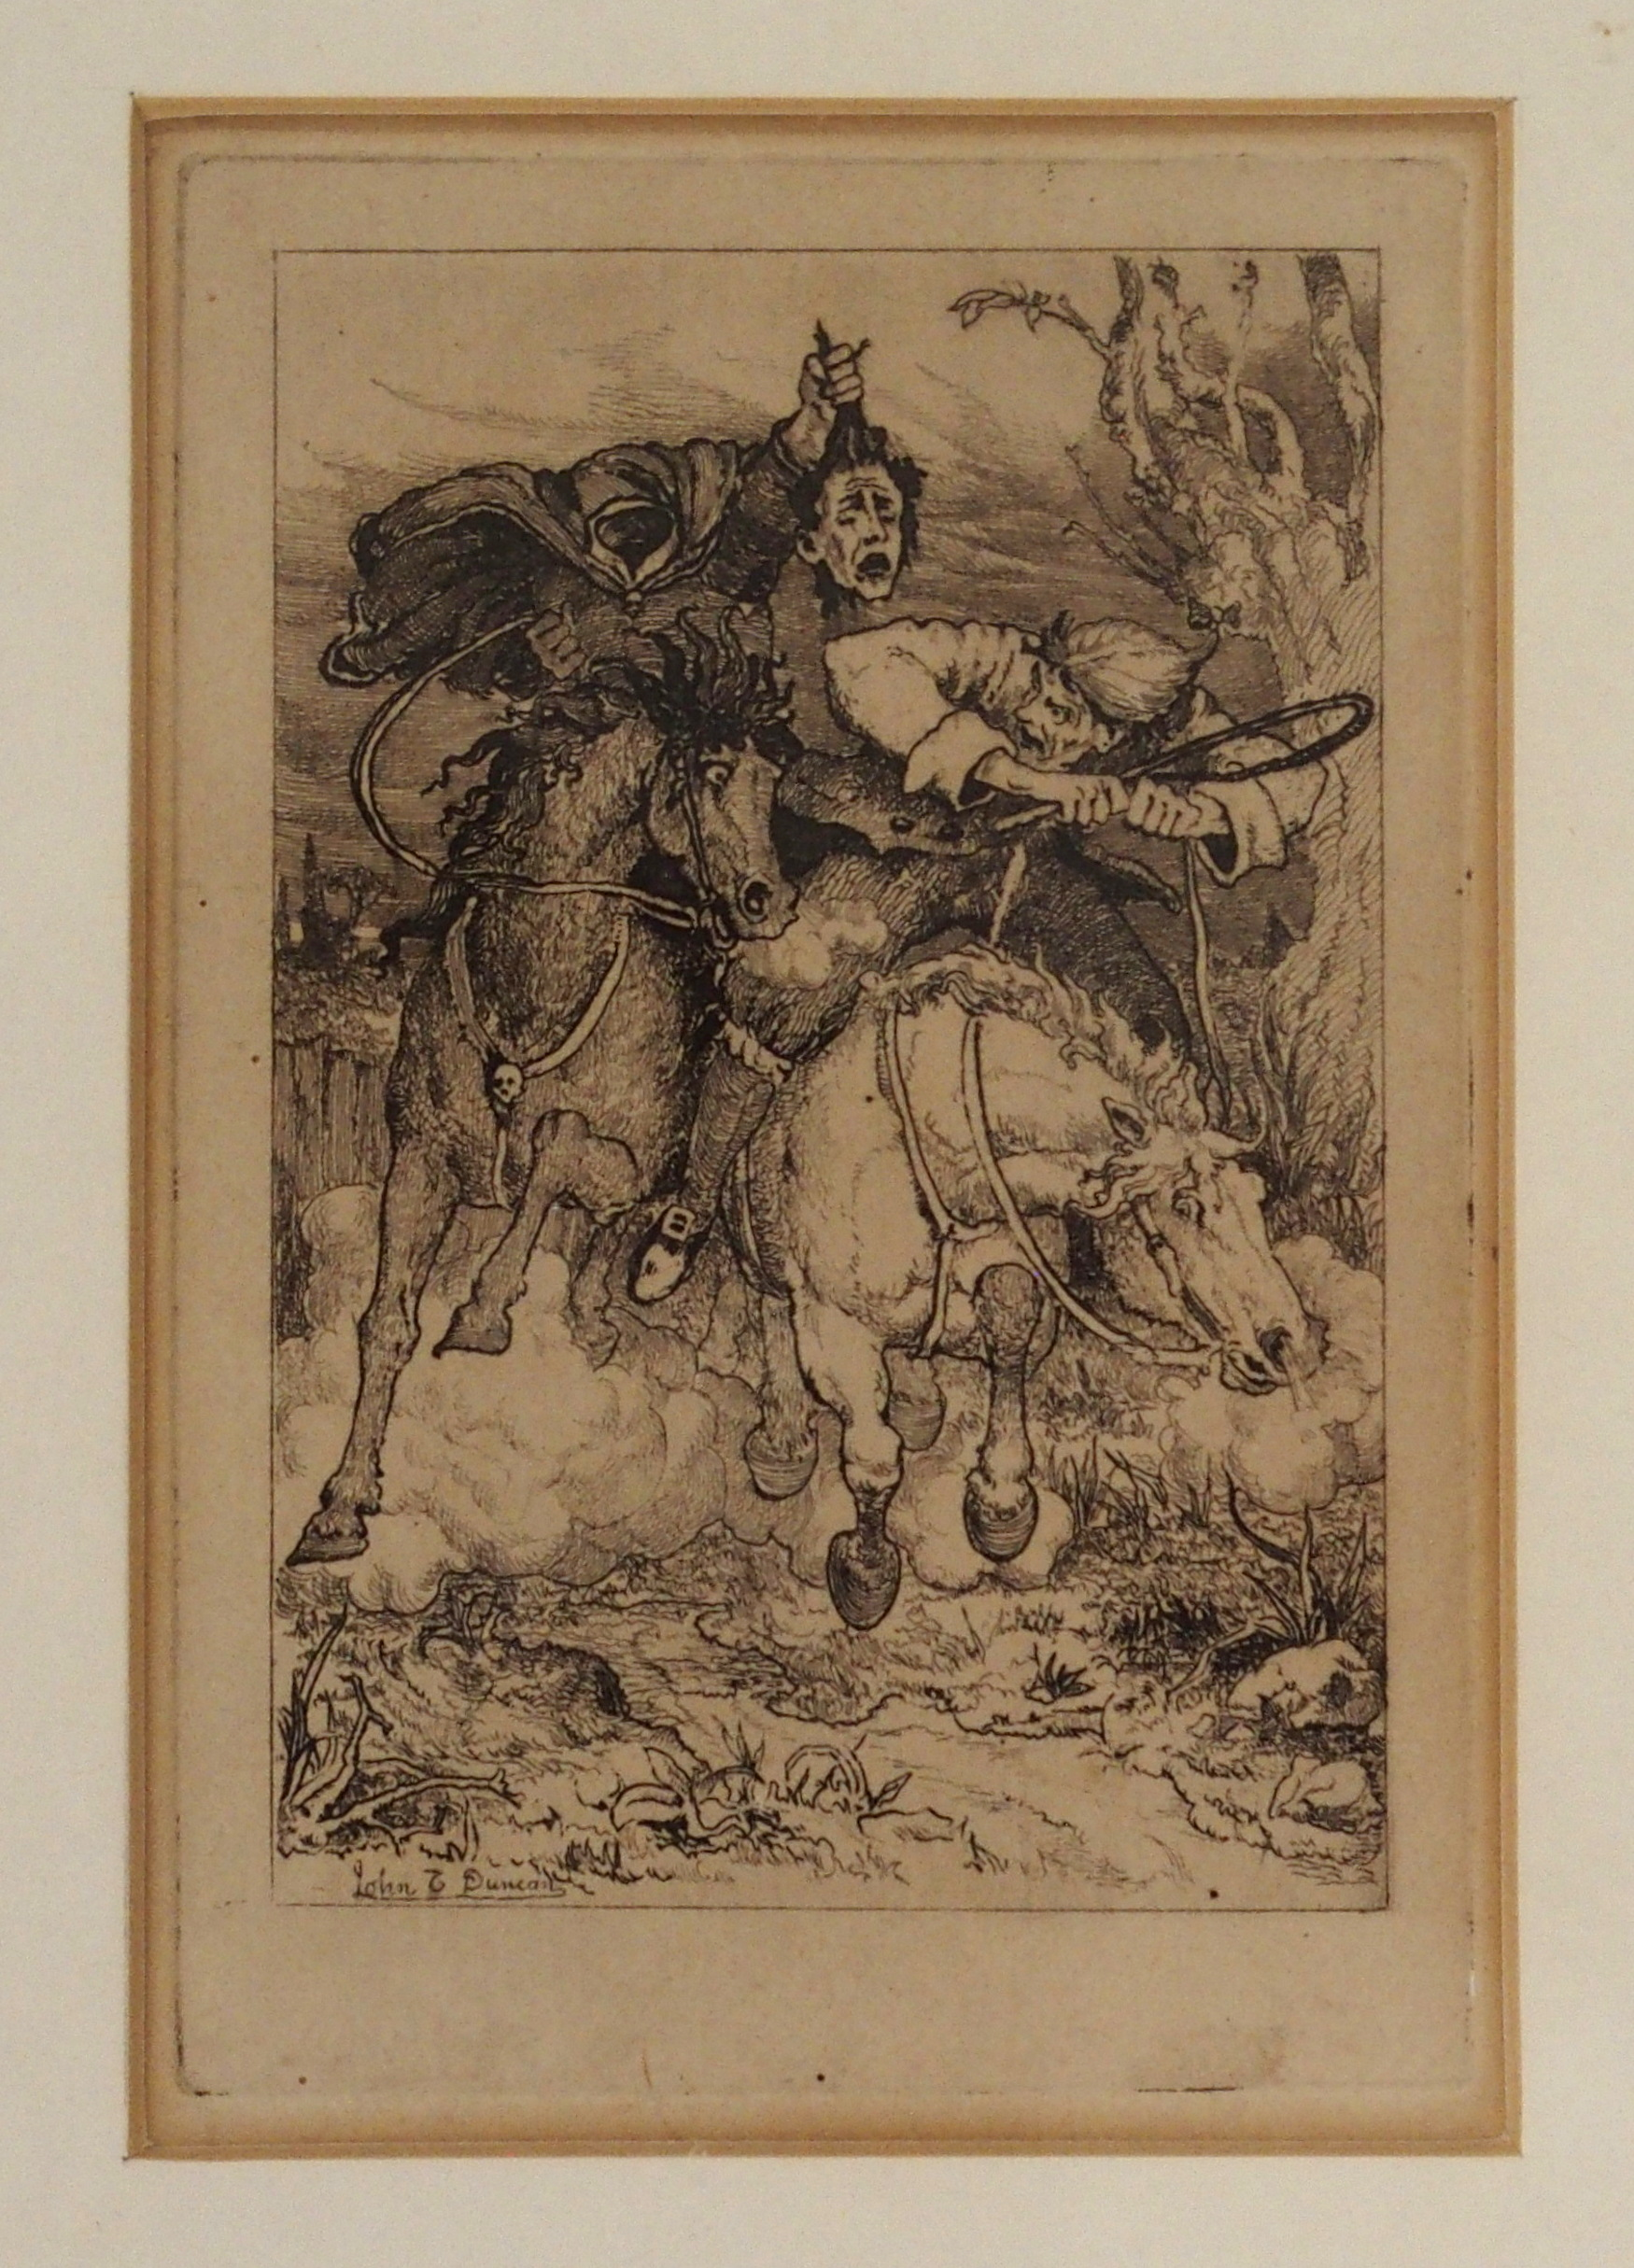 AFTER JOHN DUNCAN THE HEADLESS HORSEMAN engraving, 12 x 8cm, Admiral Viscount Duncan print, three